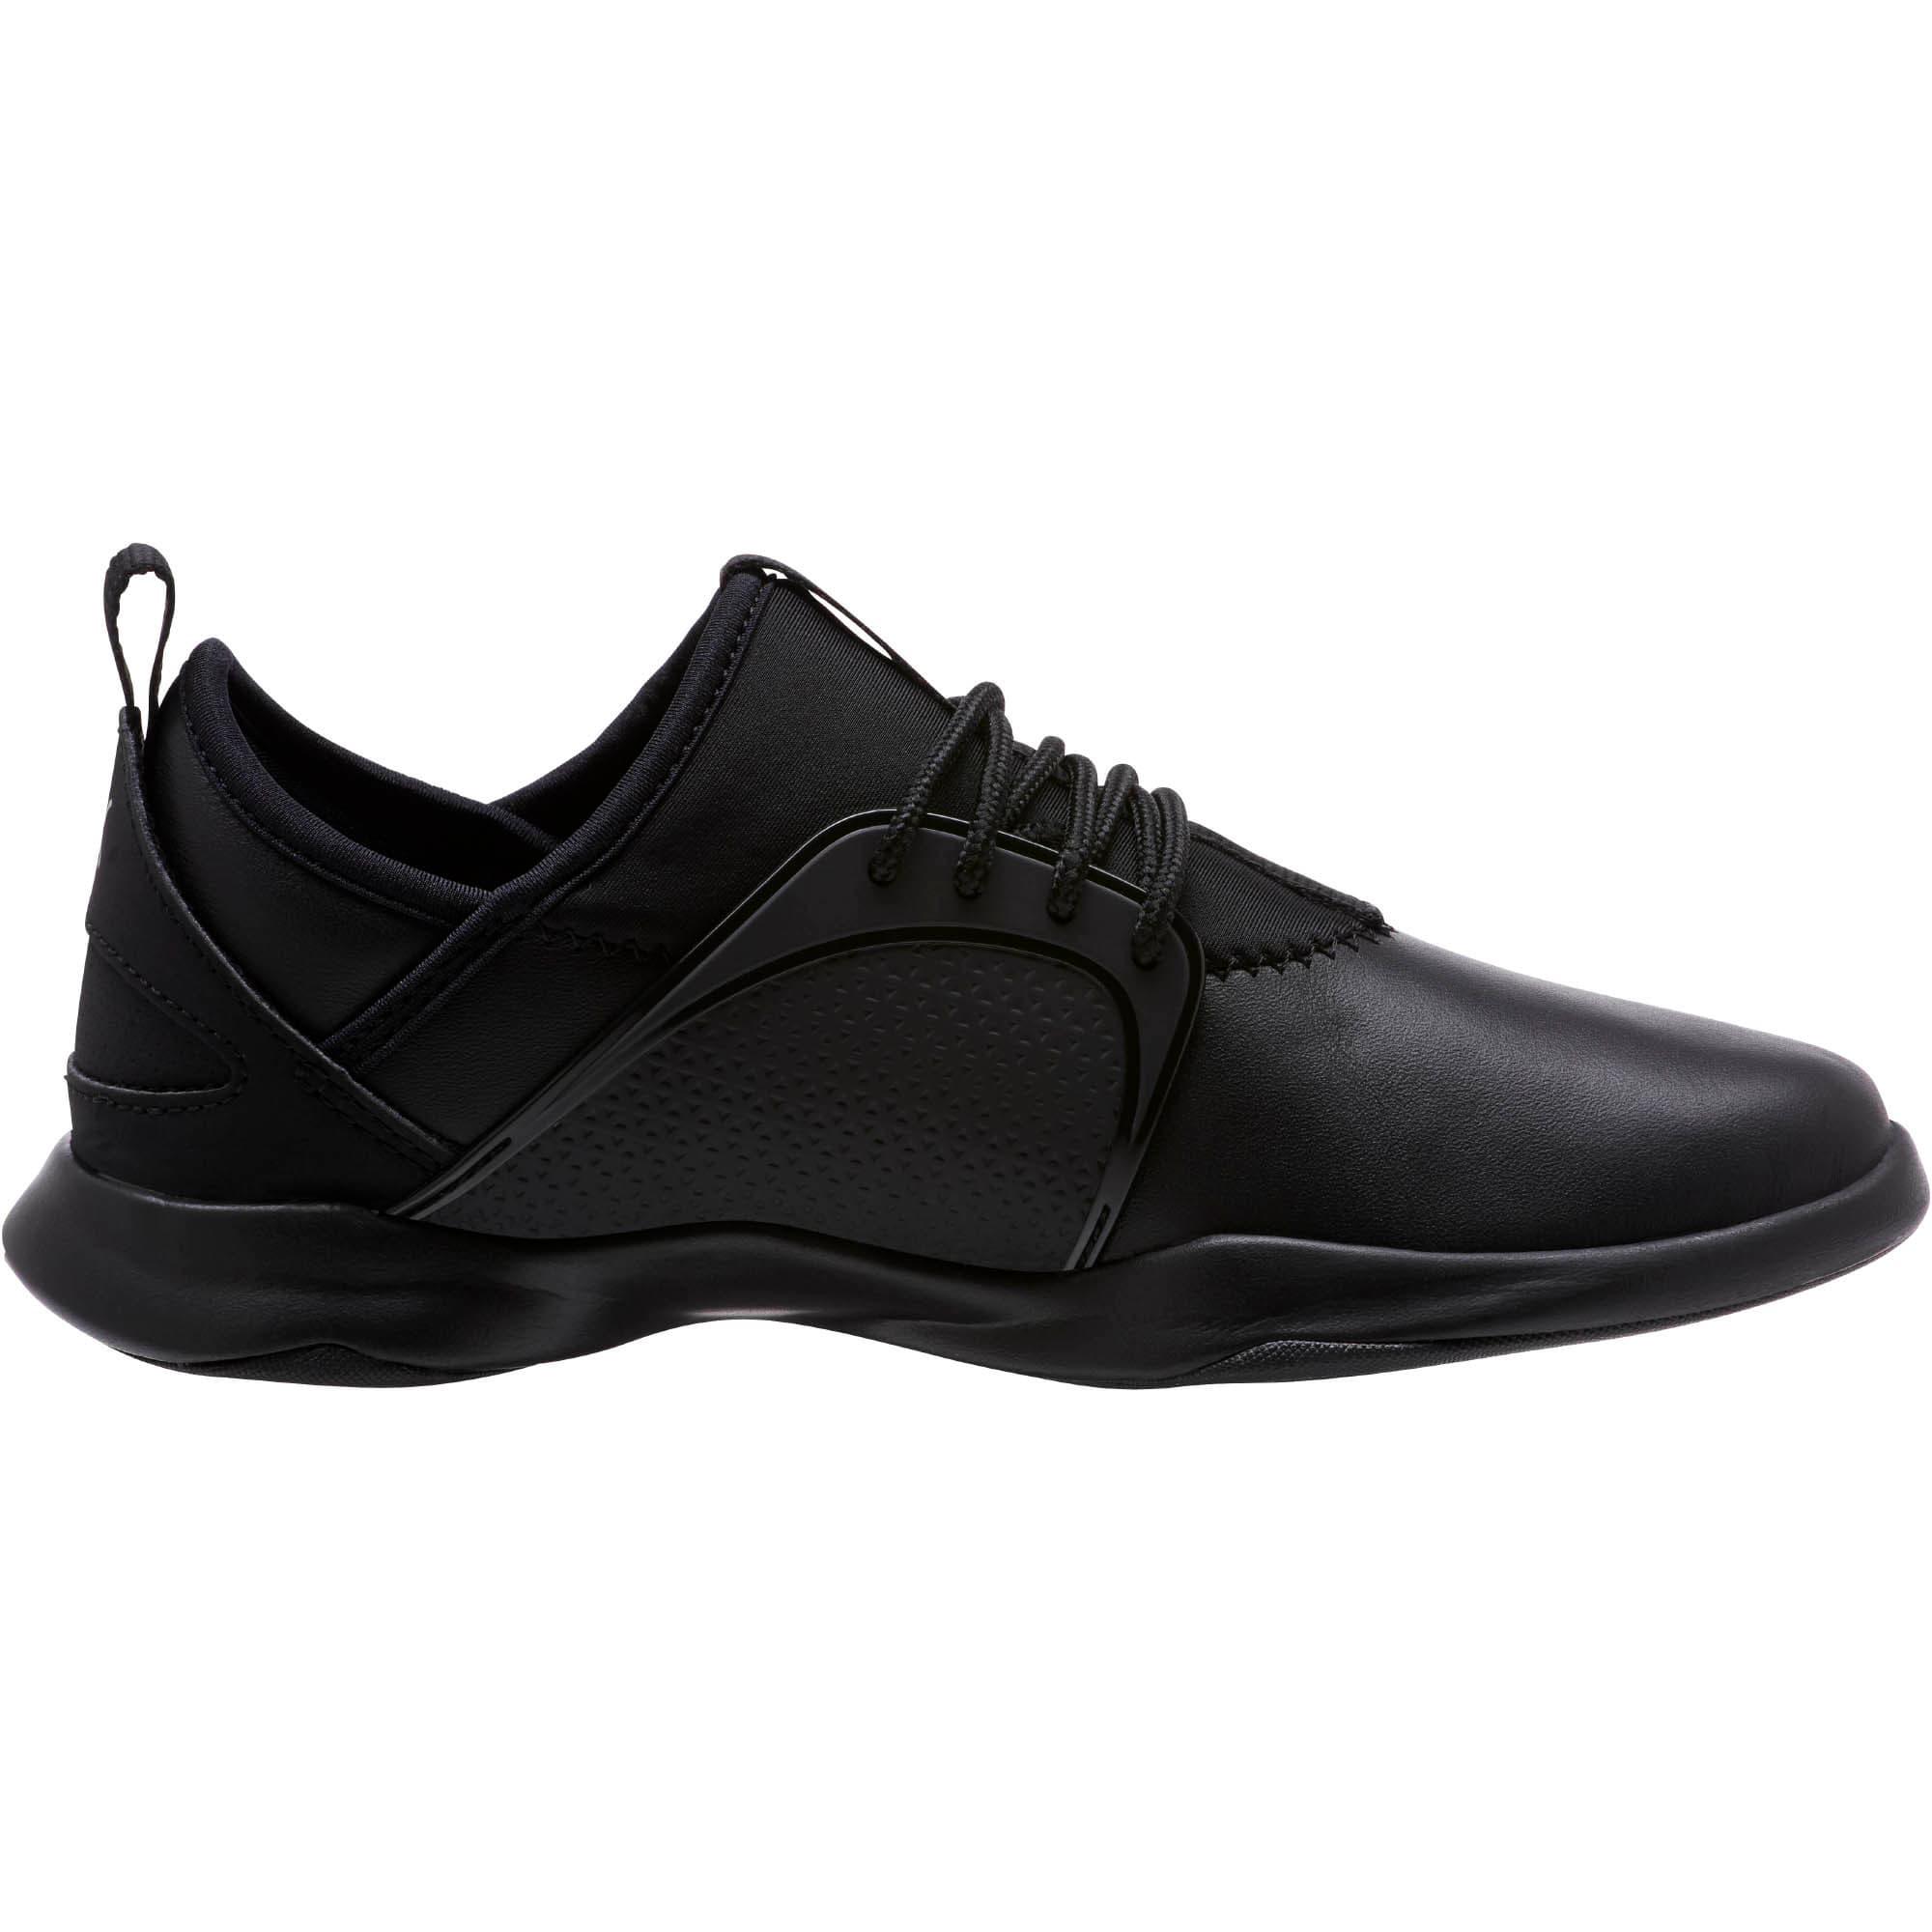 Thumbnail 3 of PUMA Dare Lace Women's Sneakers, P.Black-P.Black-P. Black, medium